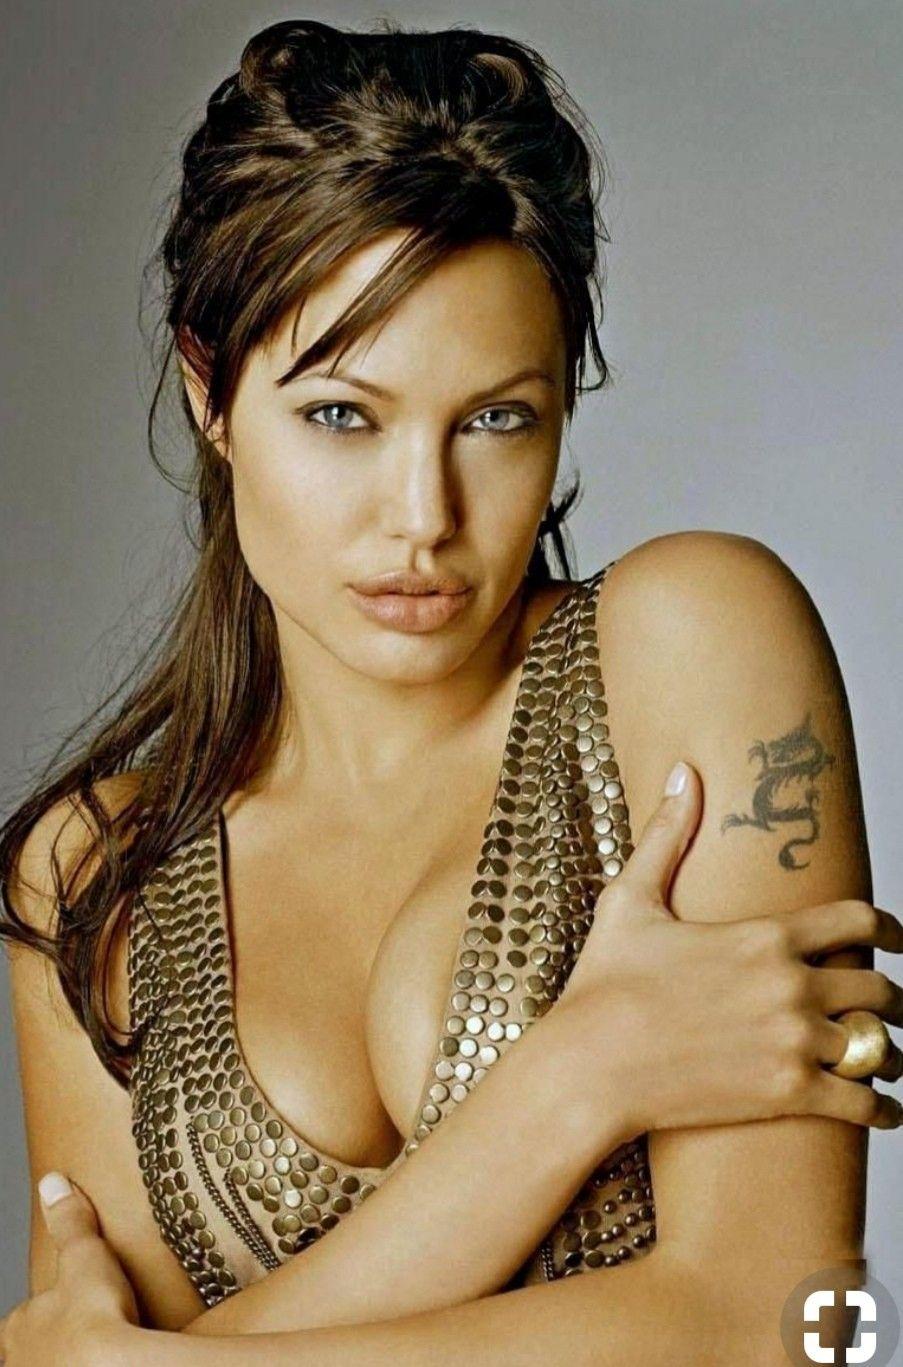 Hot Angelina Jolie naked (73 photo), Topless, Paparazzi, Boobs, underwear 2020